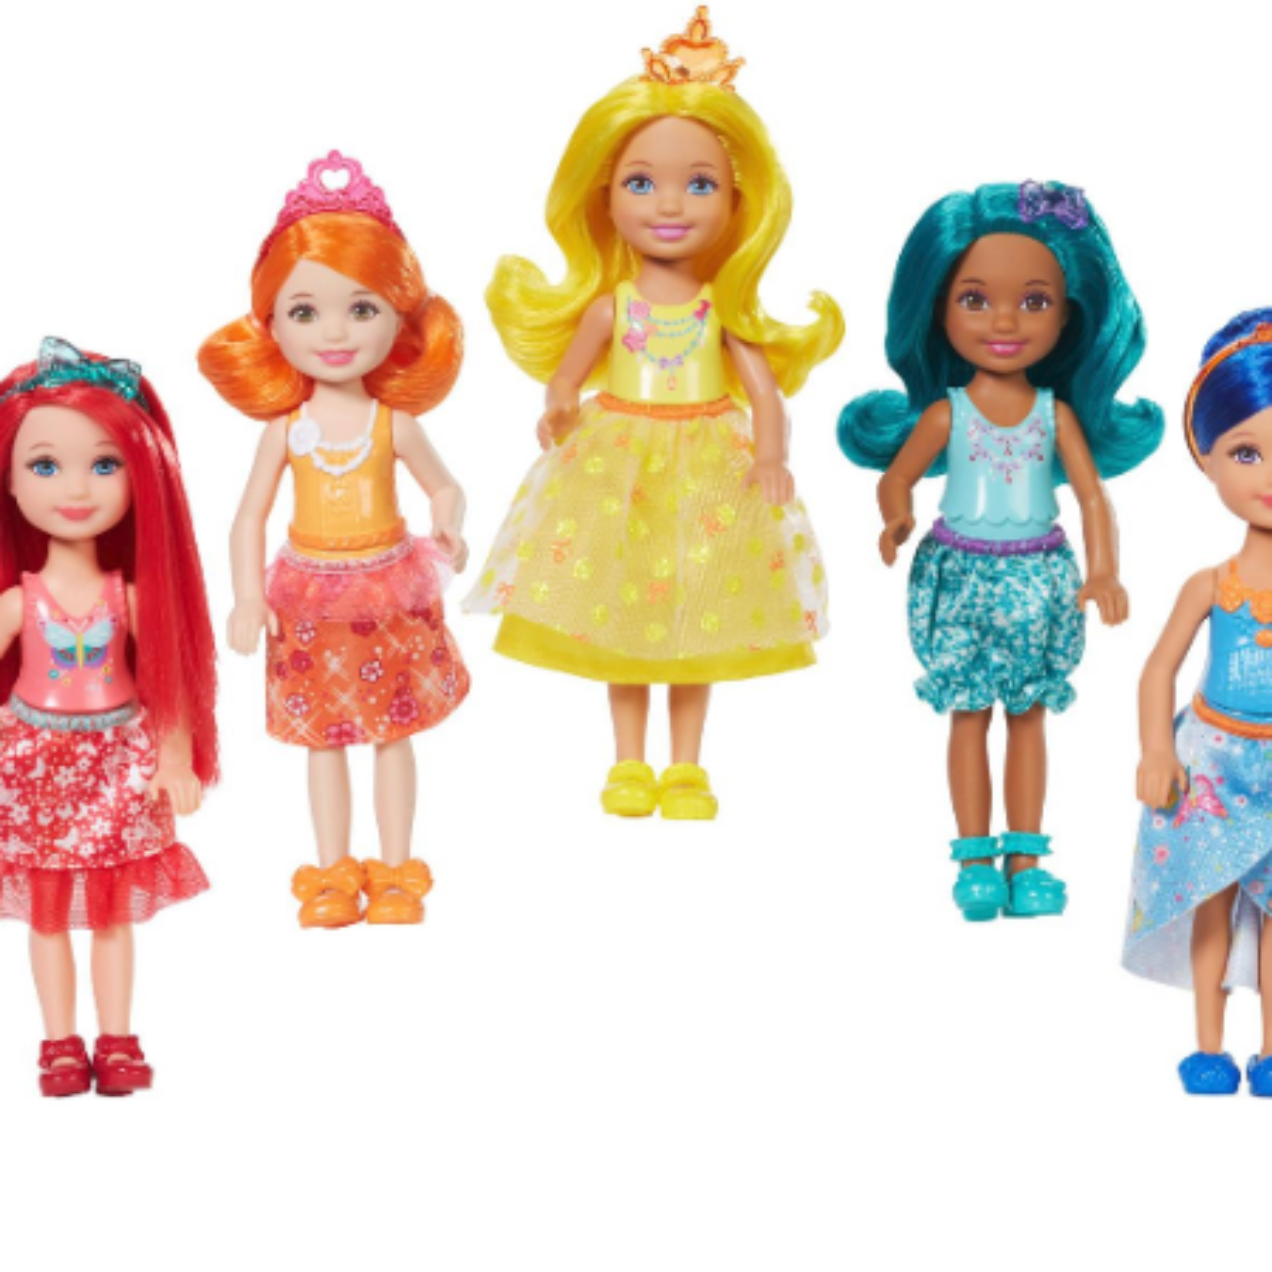 Barbie Rainbow Cove 7 Doll Gift Set Only $17.95 (Regular $44.97)